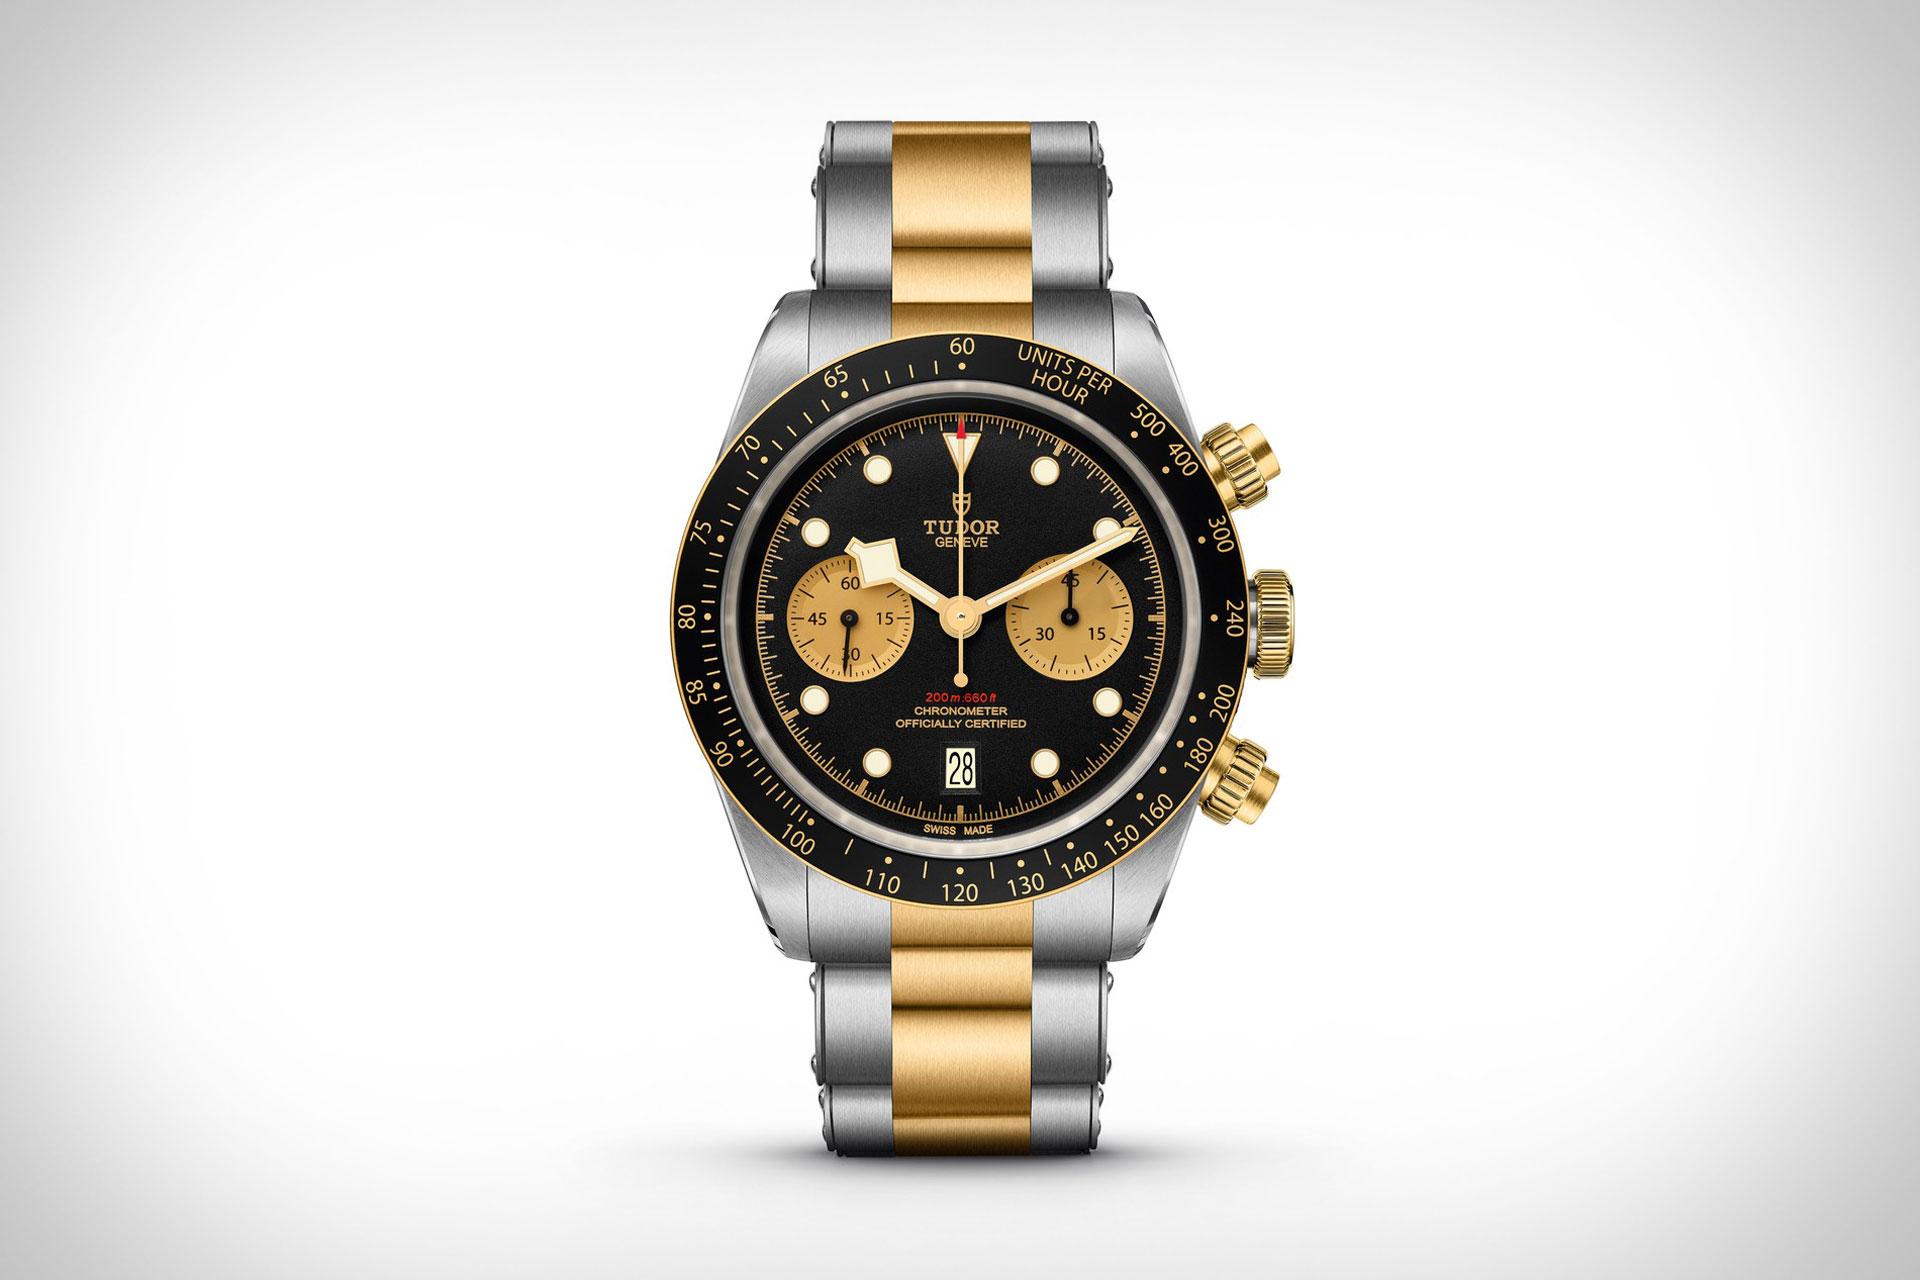 TUDOR Black Bay Chrono S&G Watch